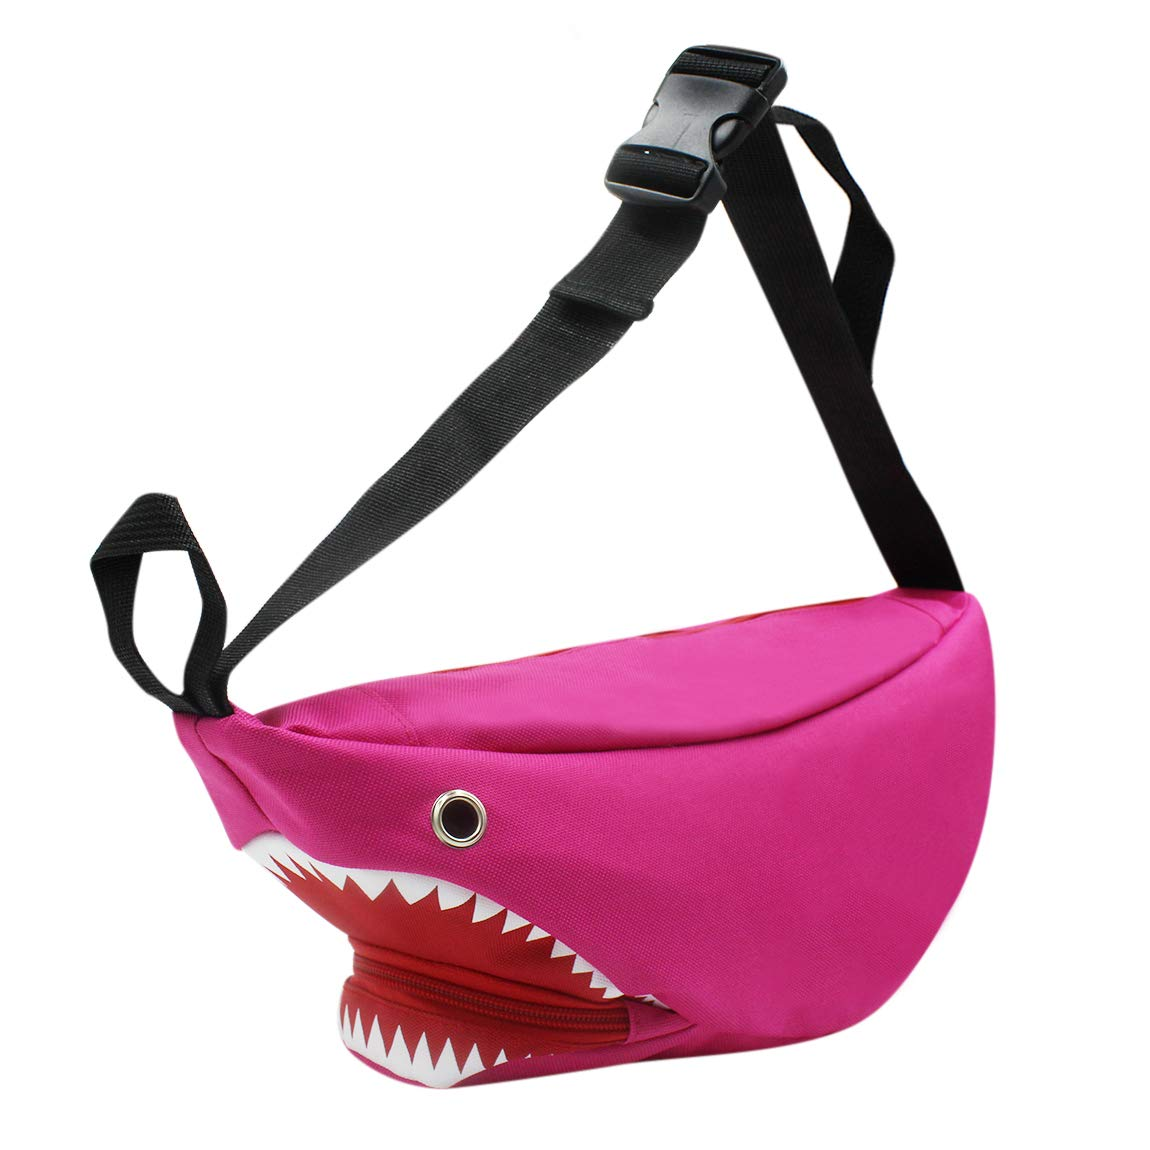 fe32d8344809 Shark Sling Bag Shoulder Chest Fanny Pack Cross Body Bag for Men & Women  (pink)